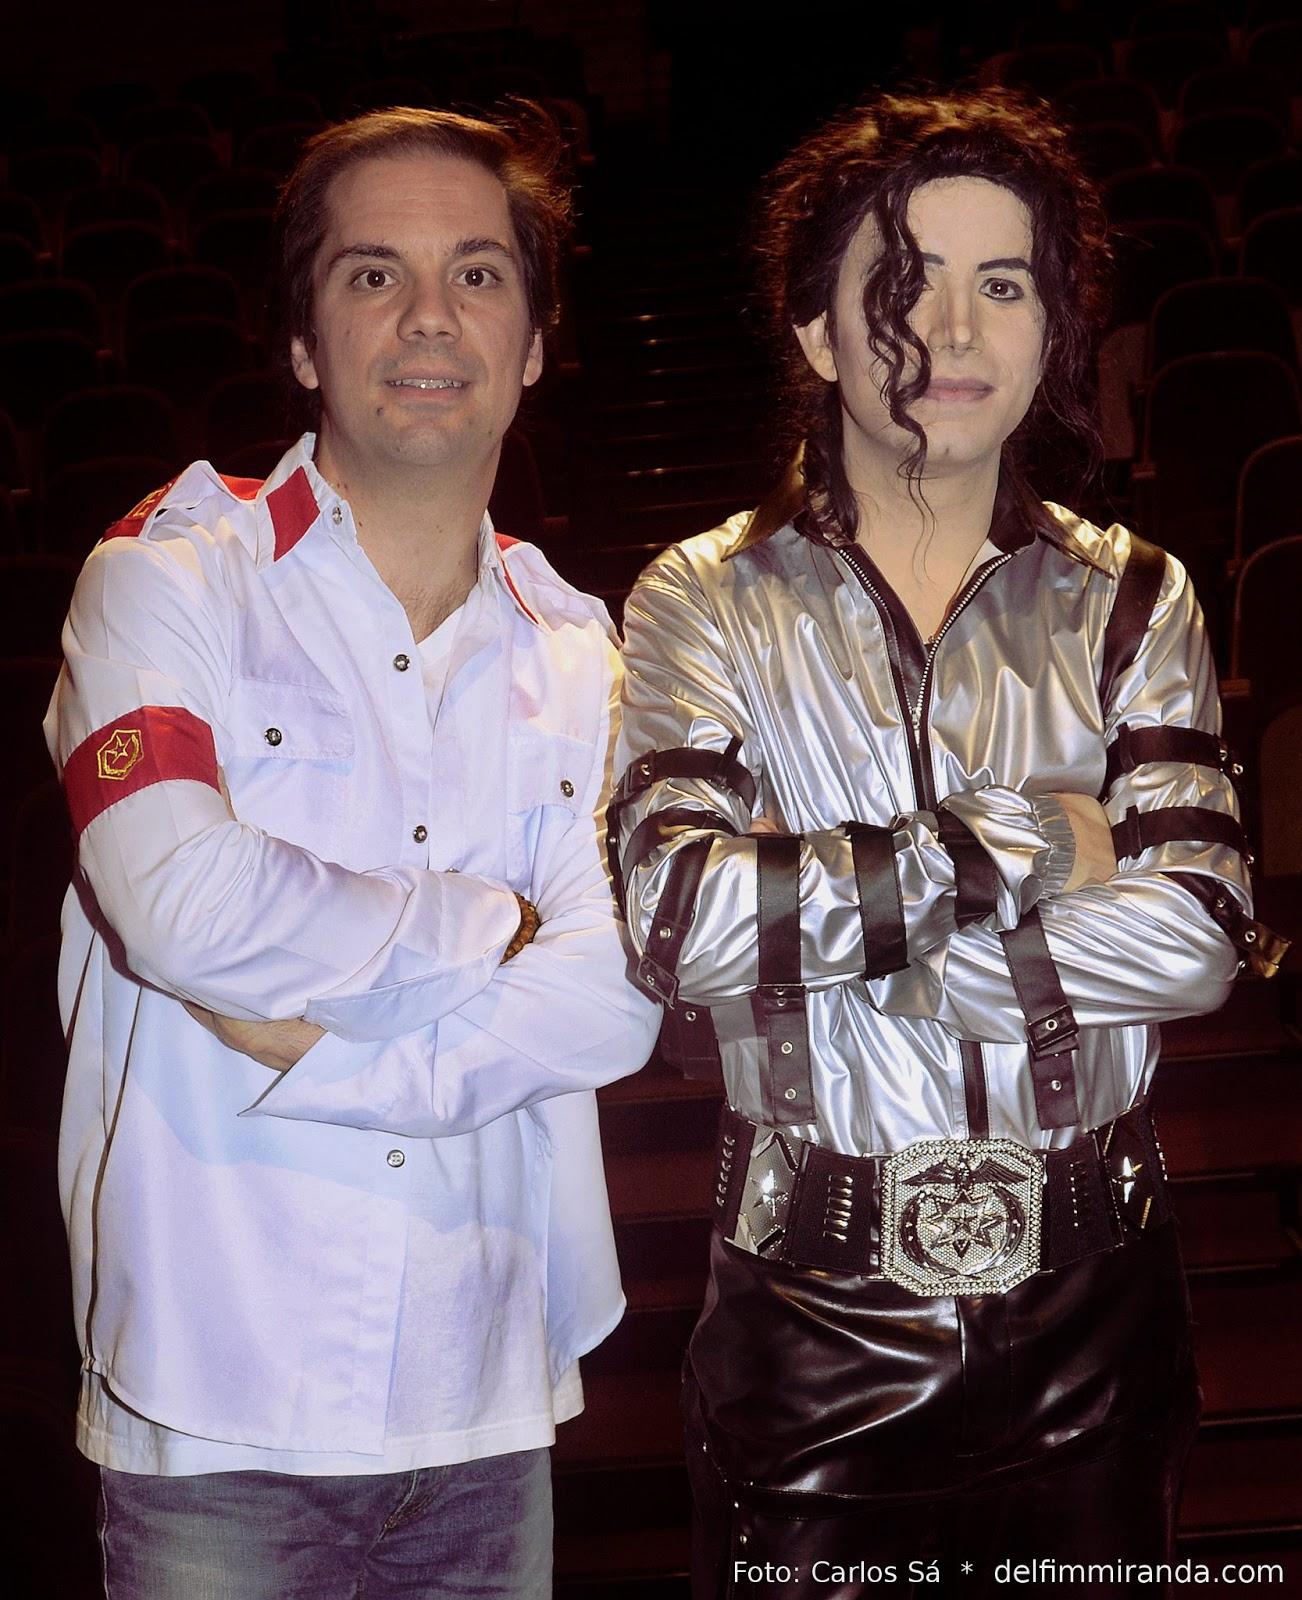 Delfim Miranda - Michael Jackson Tribute - Posing after the show with Rui Duarte